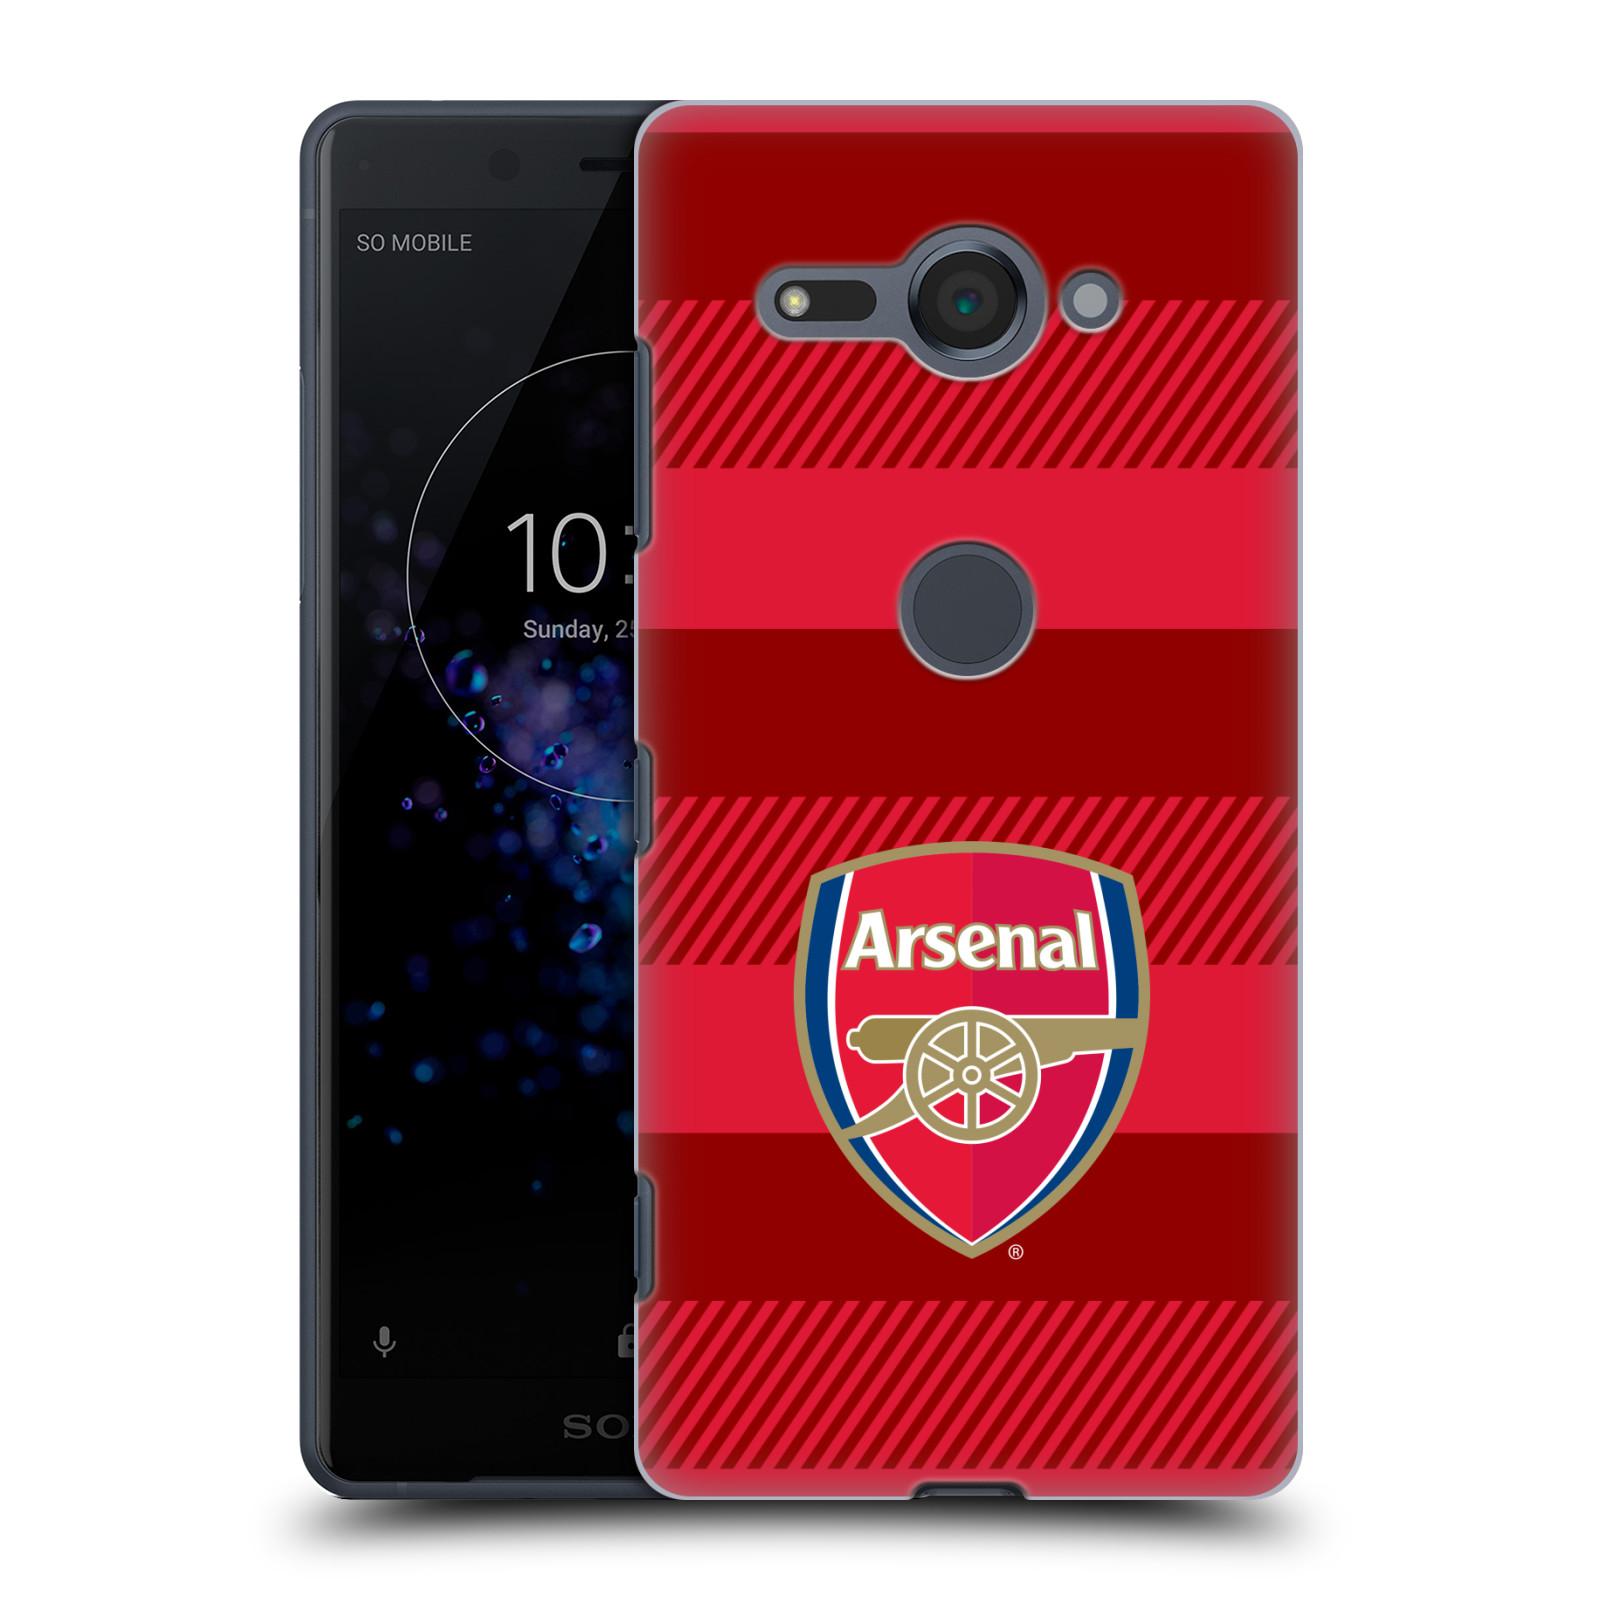 Plastové pouzdro na mobil Sony Xperia XZ2 Compact - Head Case - Arsenal FC - Logo s pruhy